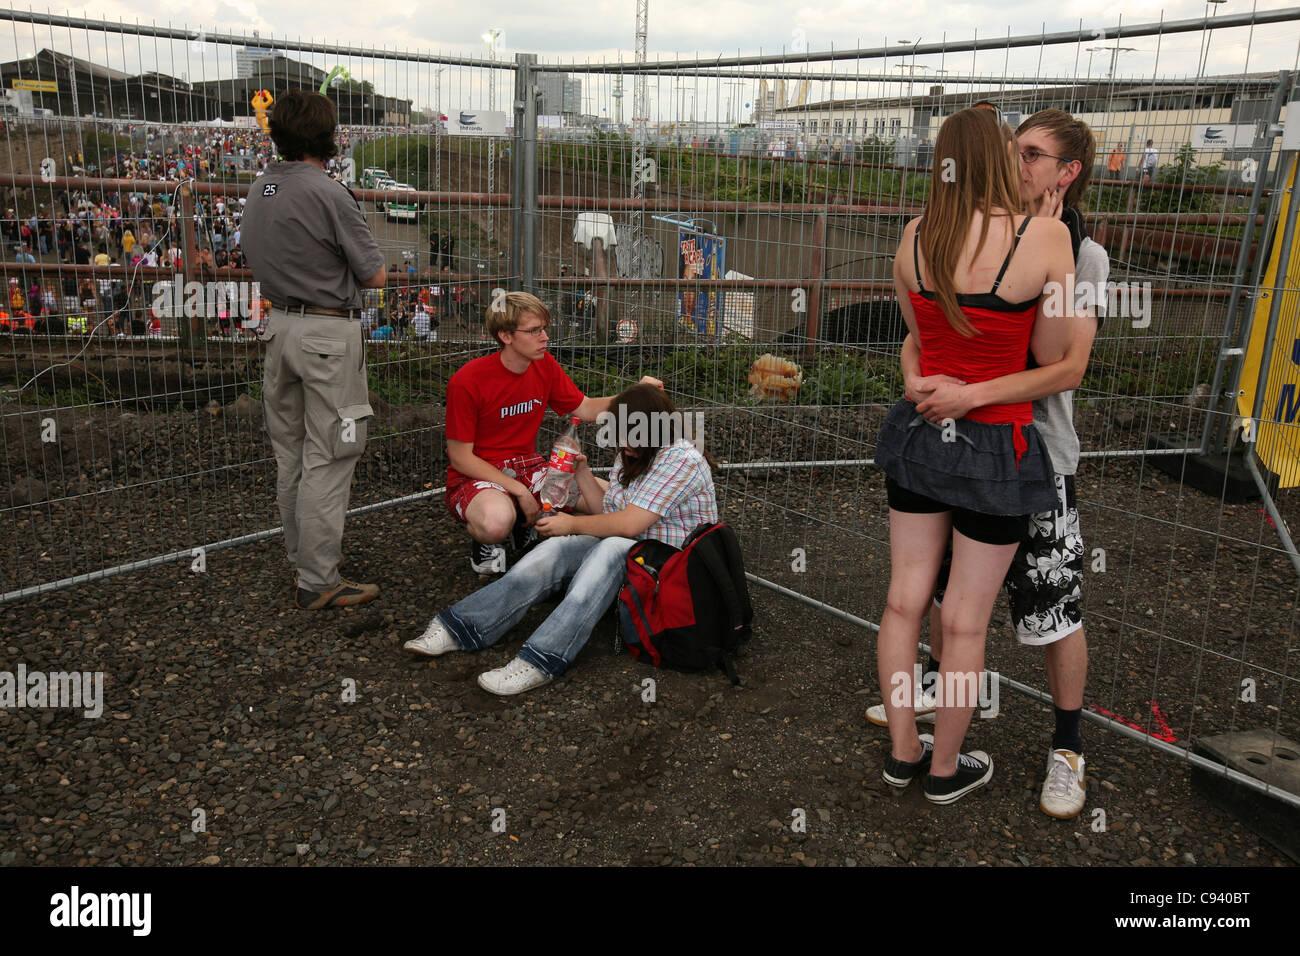 Love Parade 2010 in Duisburg, North Rhine-Westphalia, Germany. - Stock Image